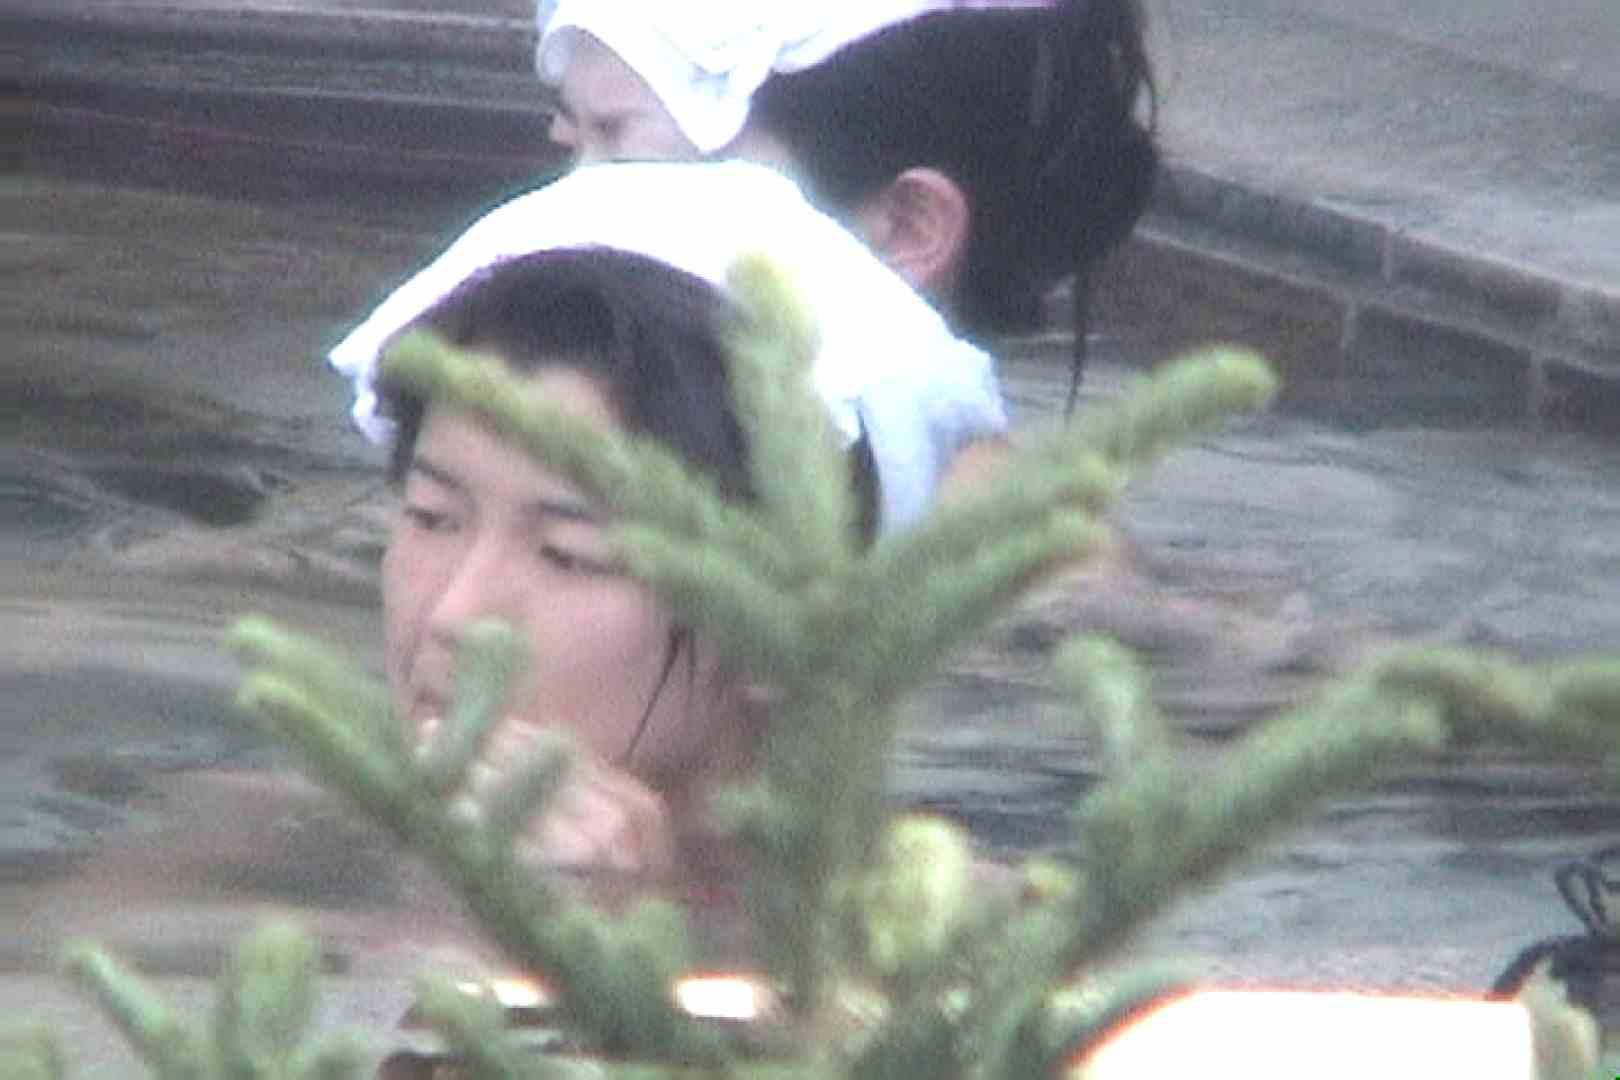 Aquaな露天風呂Vol.80【VIP限定】 盗撮 | HなOL  66pic 58